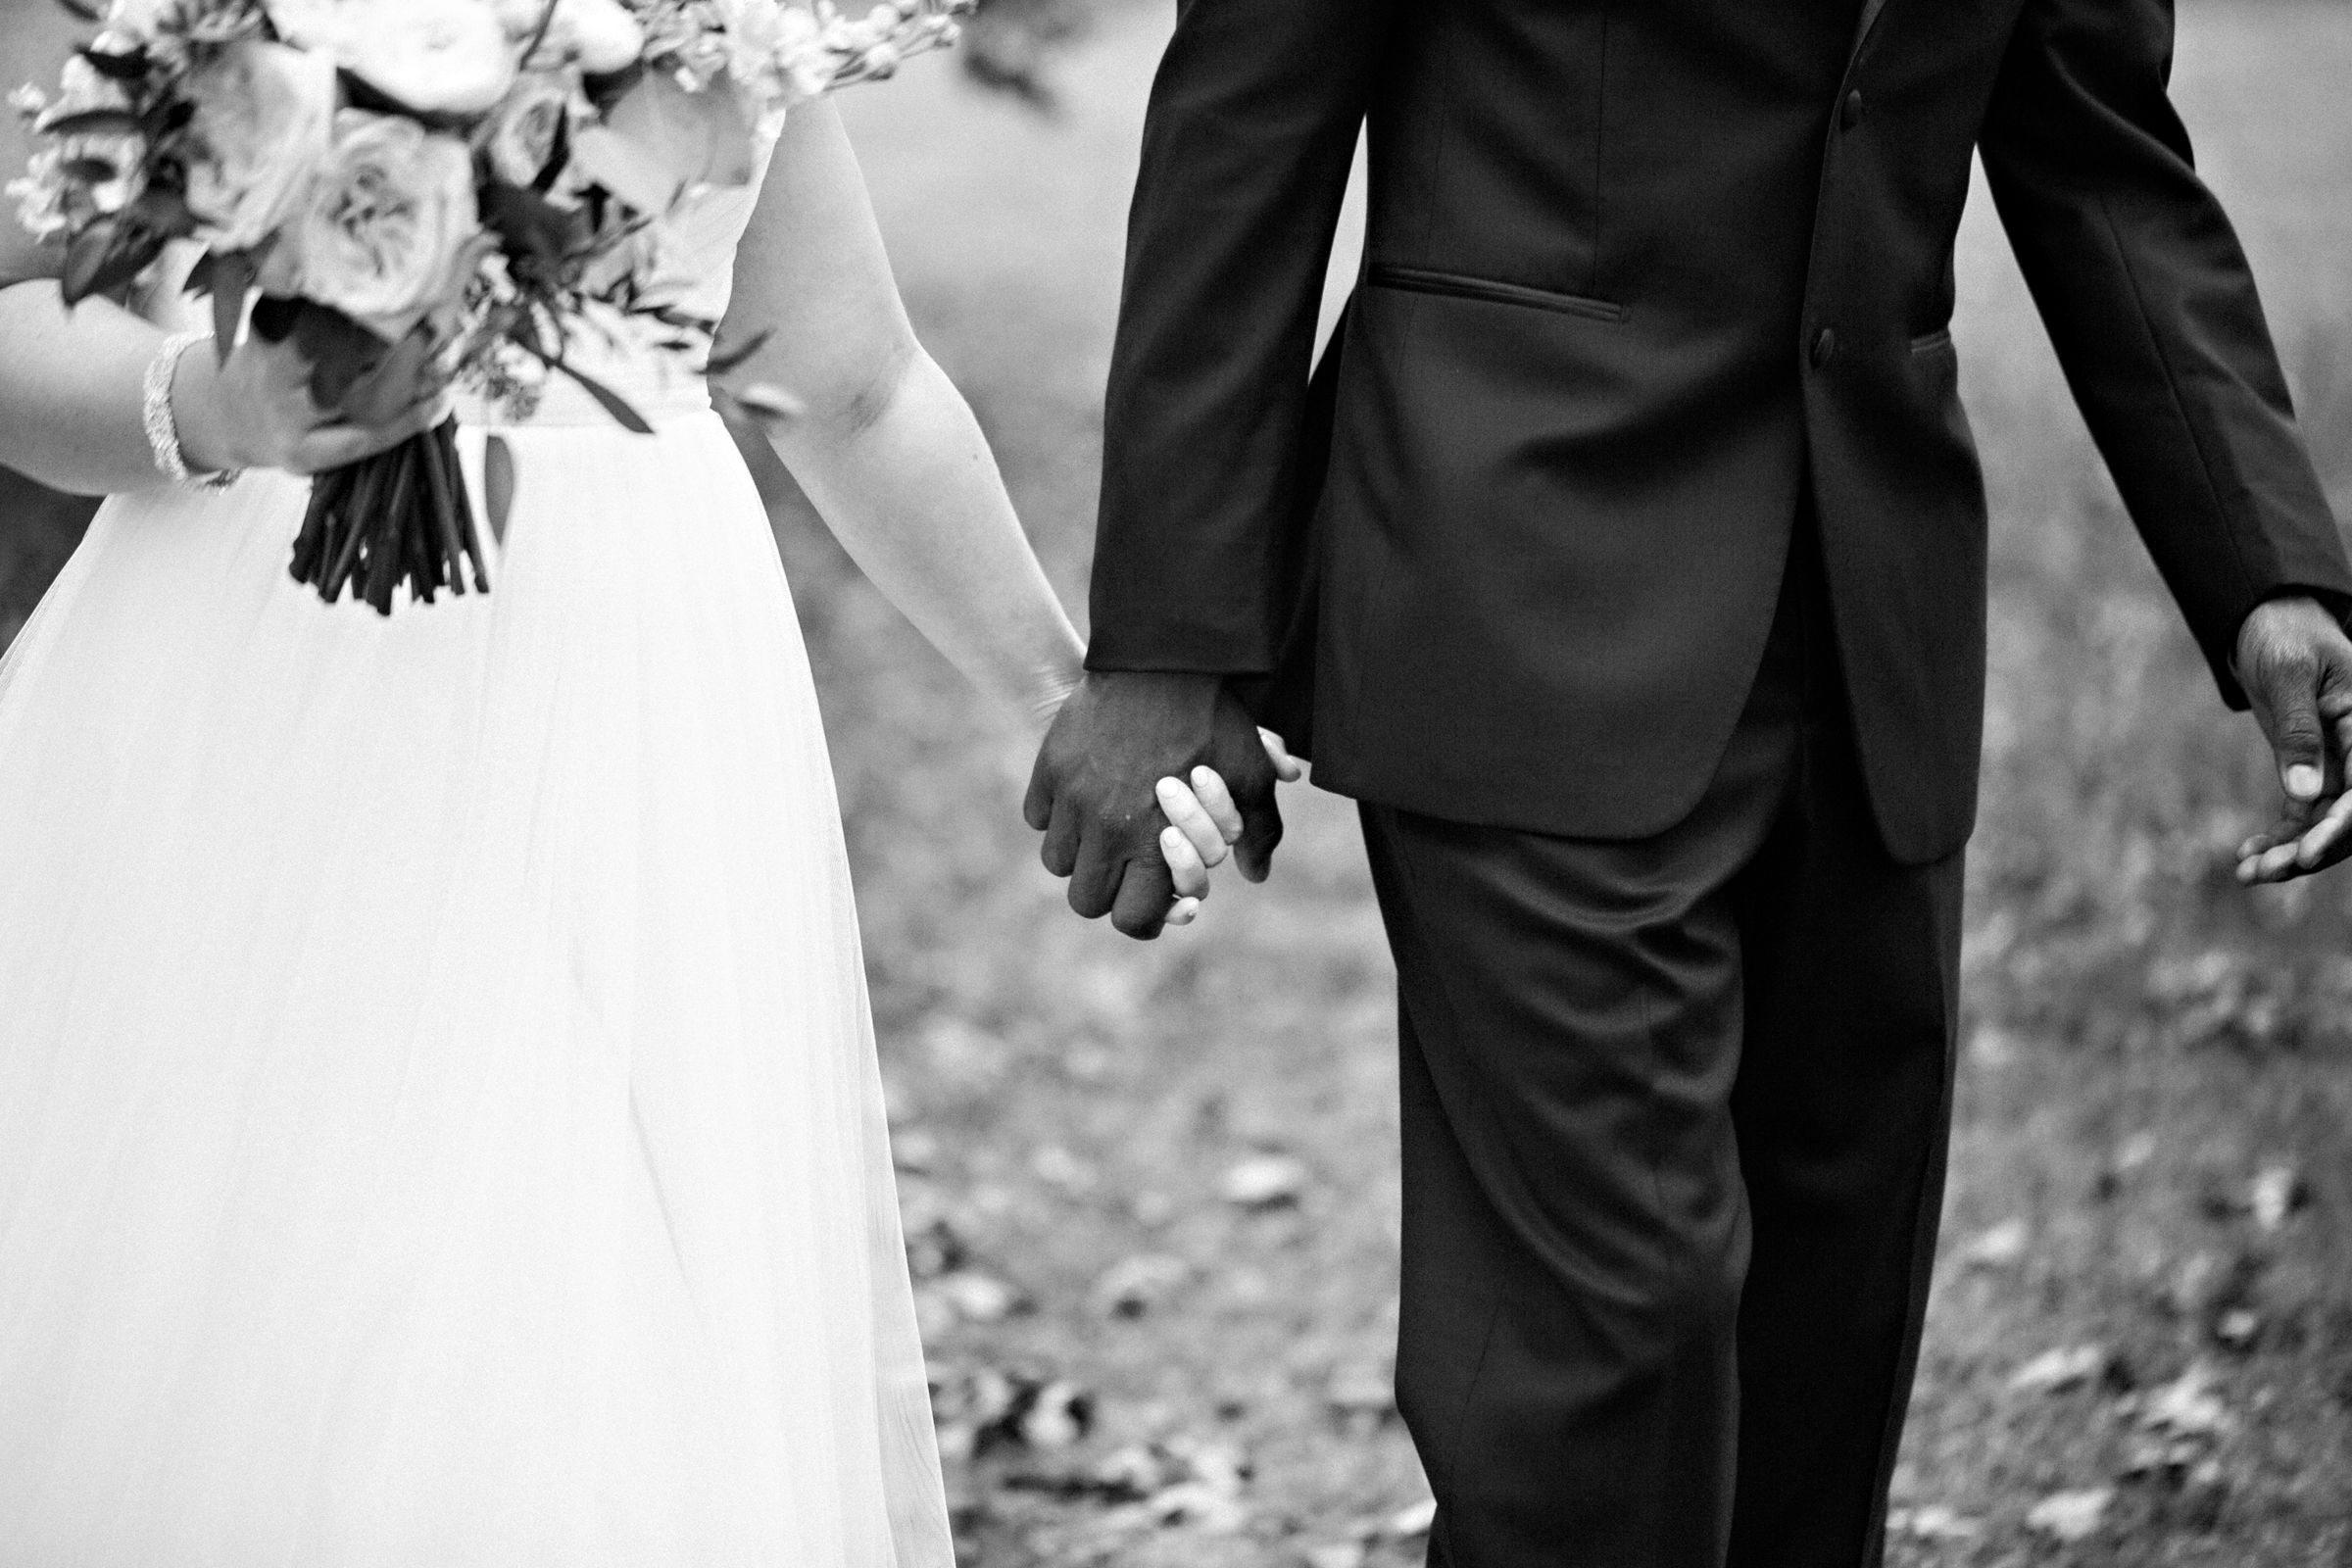 Alabama-Wedding-Photography-Nick-Drollette-Cory-Laura-132.jpg